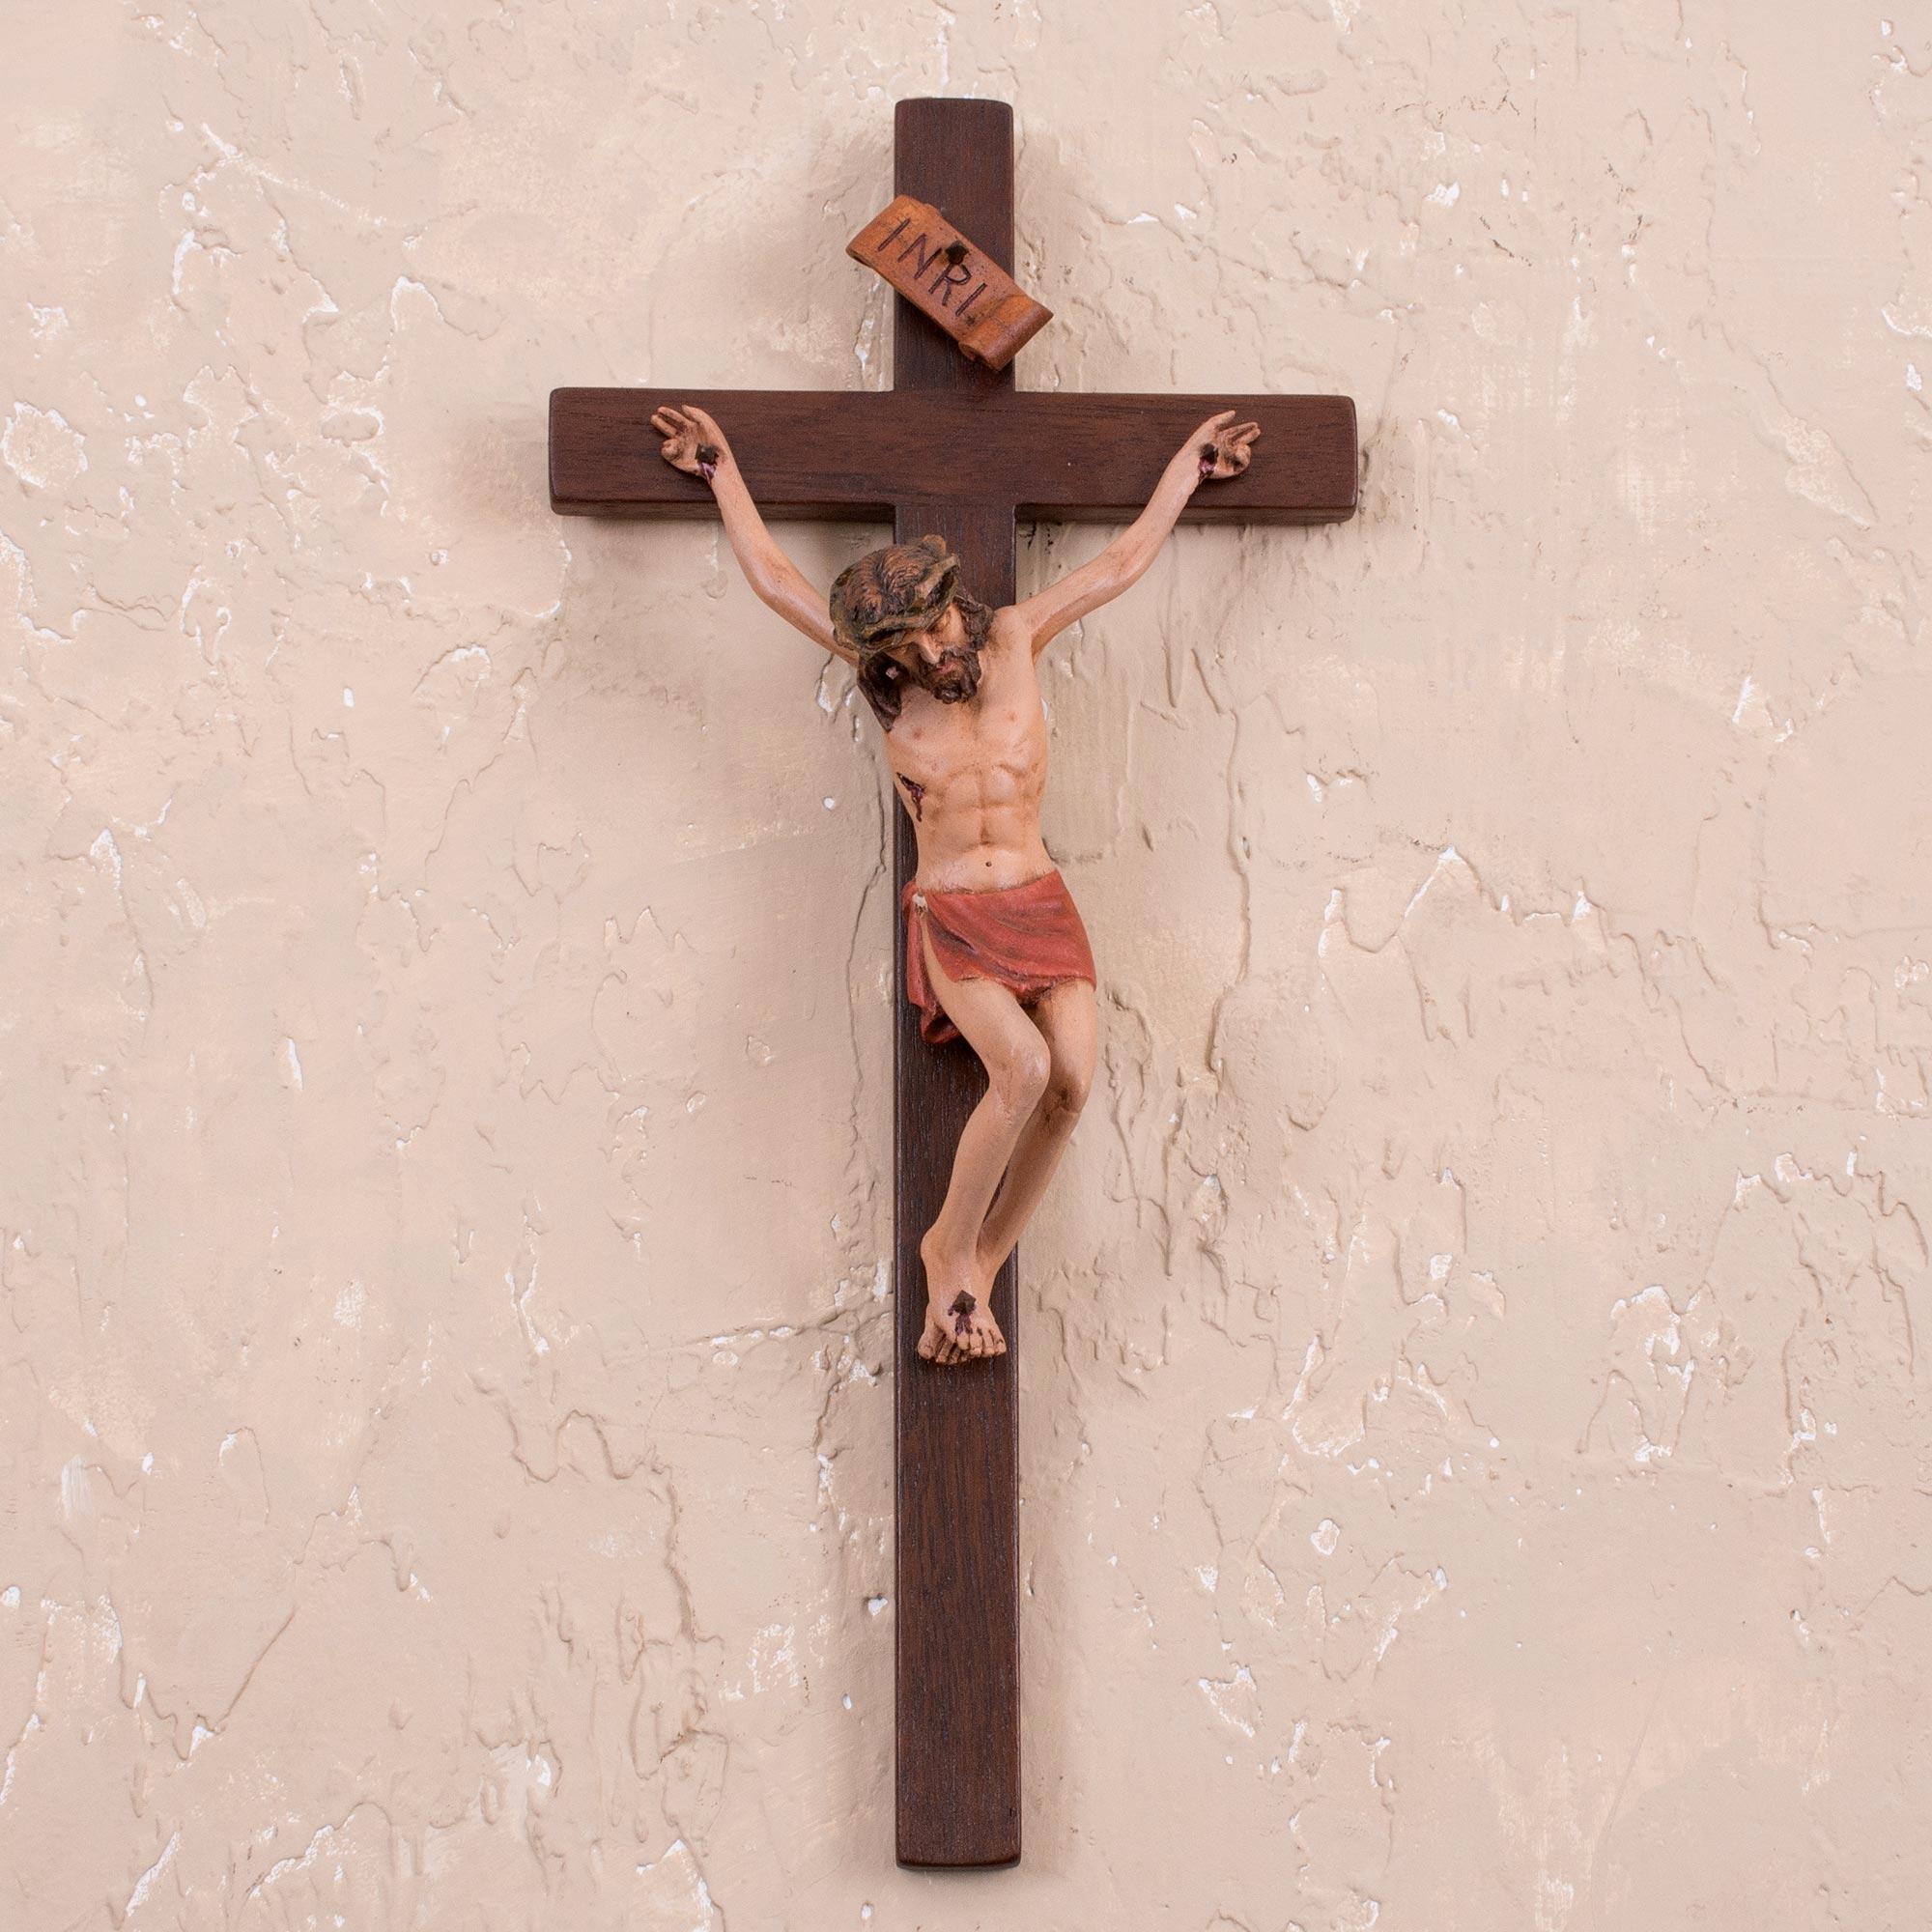 Handmade Crucifix Christianity Wood Cross from Peru - Jesus Christ | NOVICA